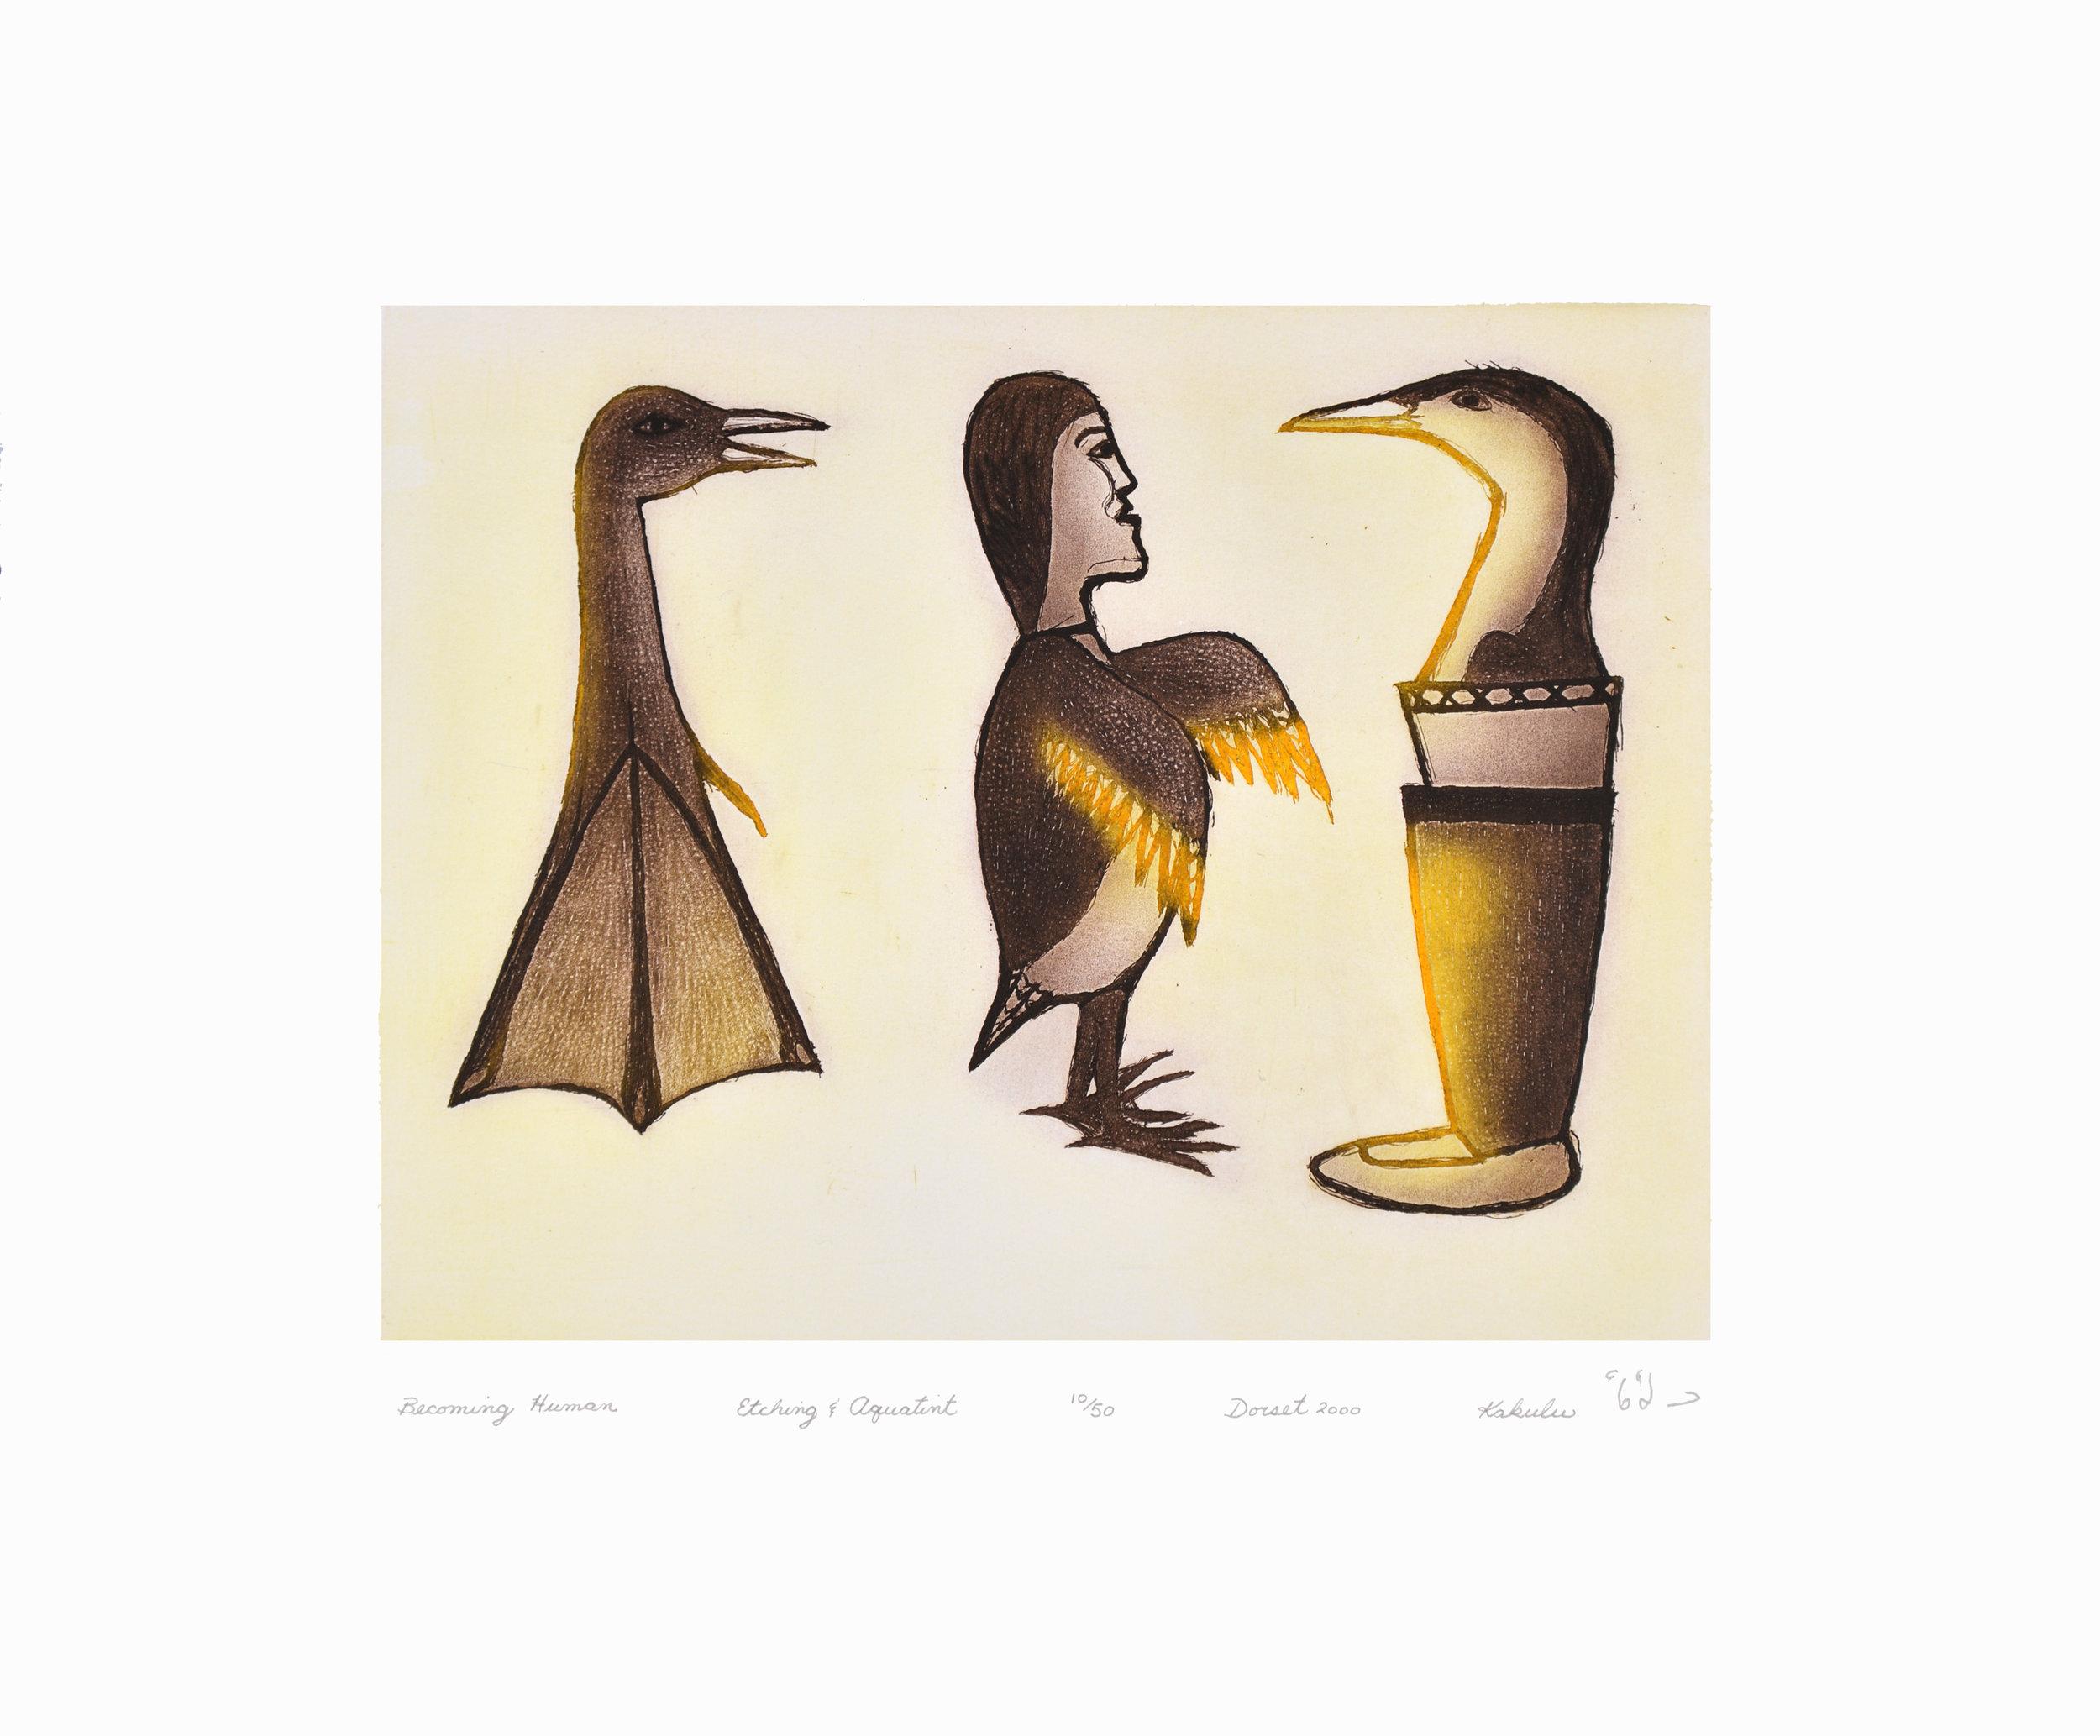 Kakulu Saggiaktok  BECOMING HUMAN Etching & Aquatint 2000 40 x 48 cm $350.00 CDN Released in the 2000 Spring collection Dorset ID#: 2000-S06